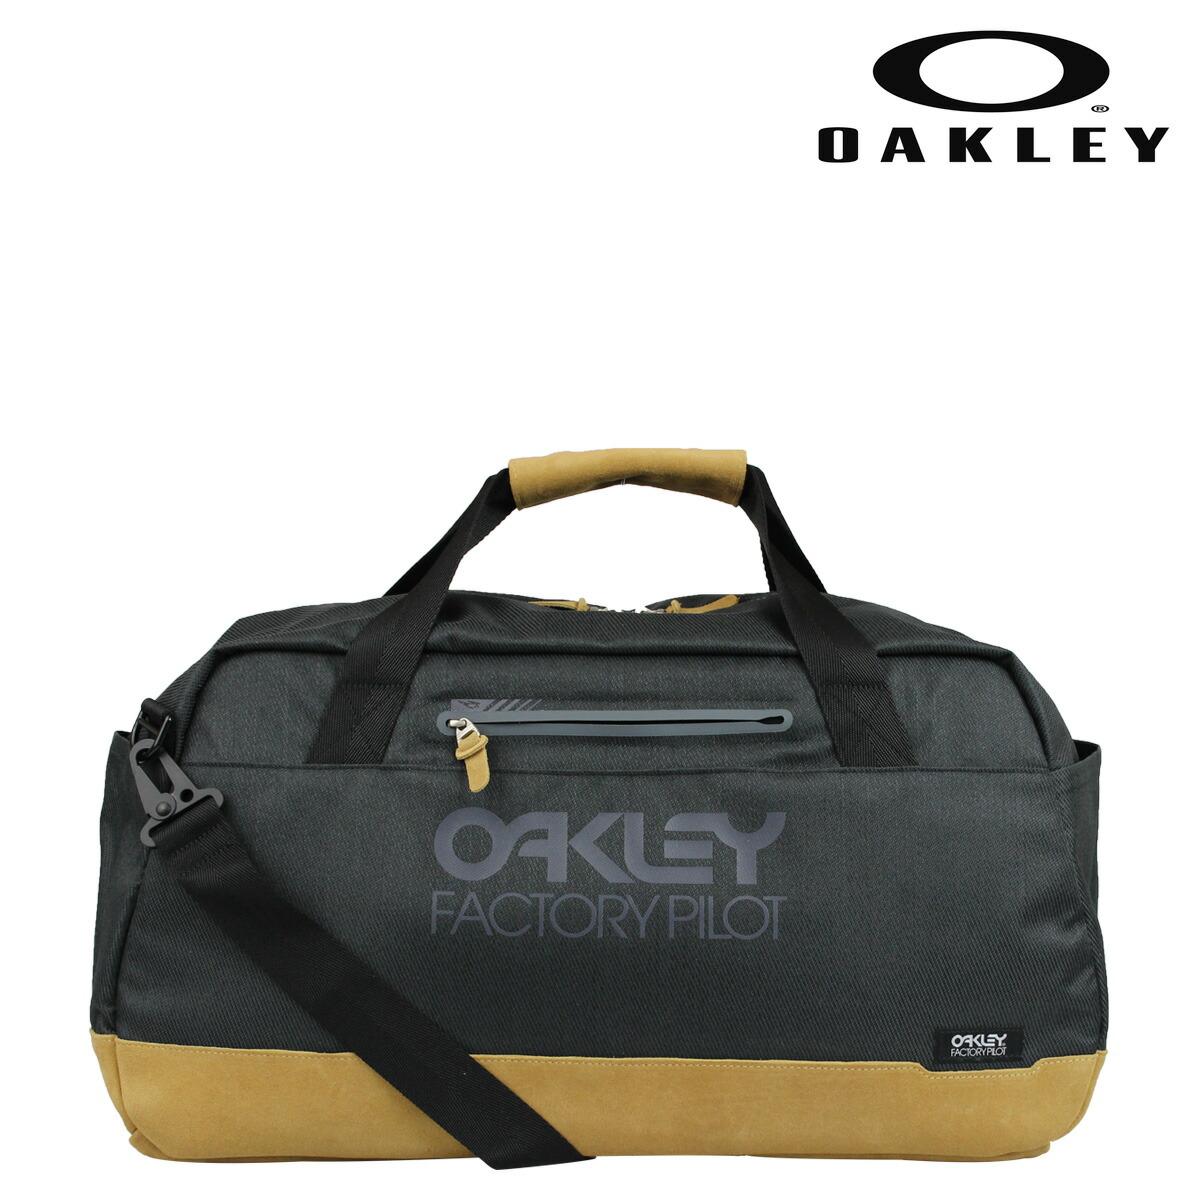 a0ddc7bd9db4 Oakley Factory Pilot Weekender « Heritage Malta